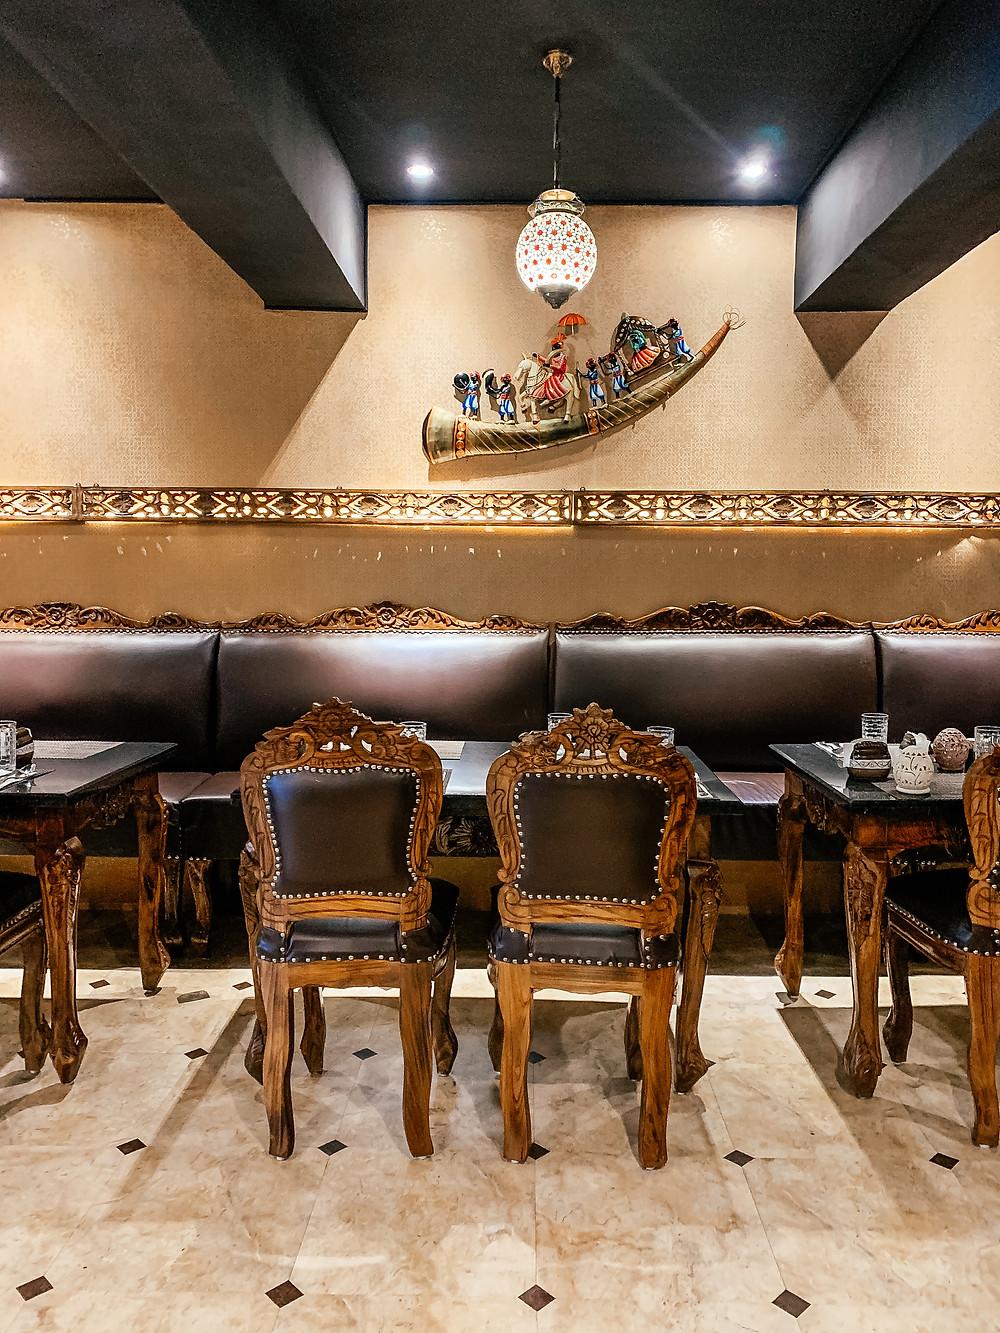 Moksha Indian Restaurant Daan Taipei l A Style Alike l Taipei Eats l Taipei Indian Food